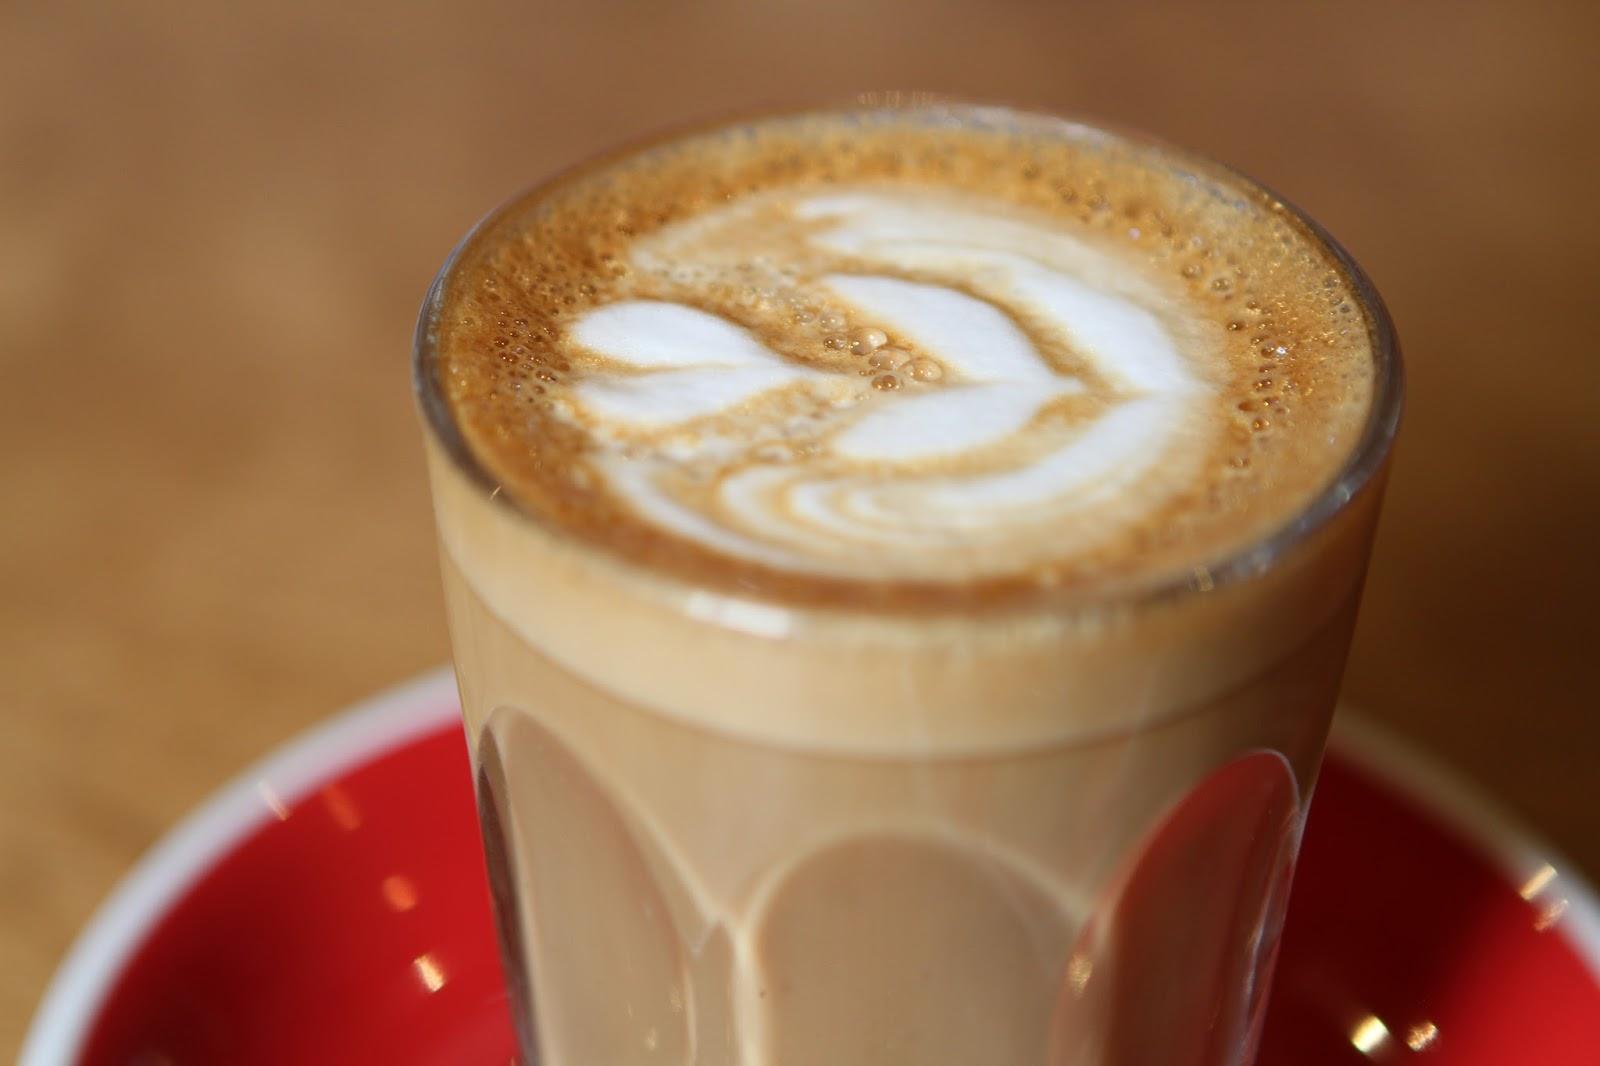 London Grind coffee